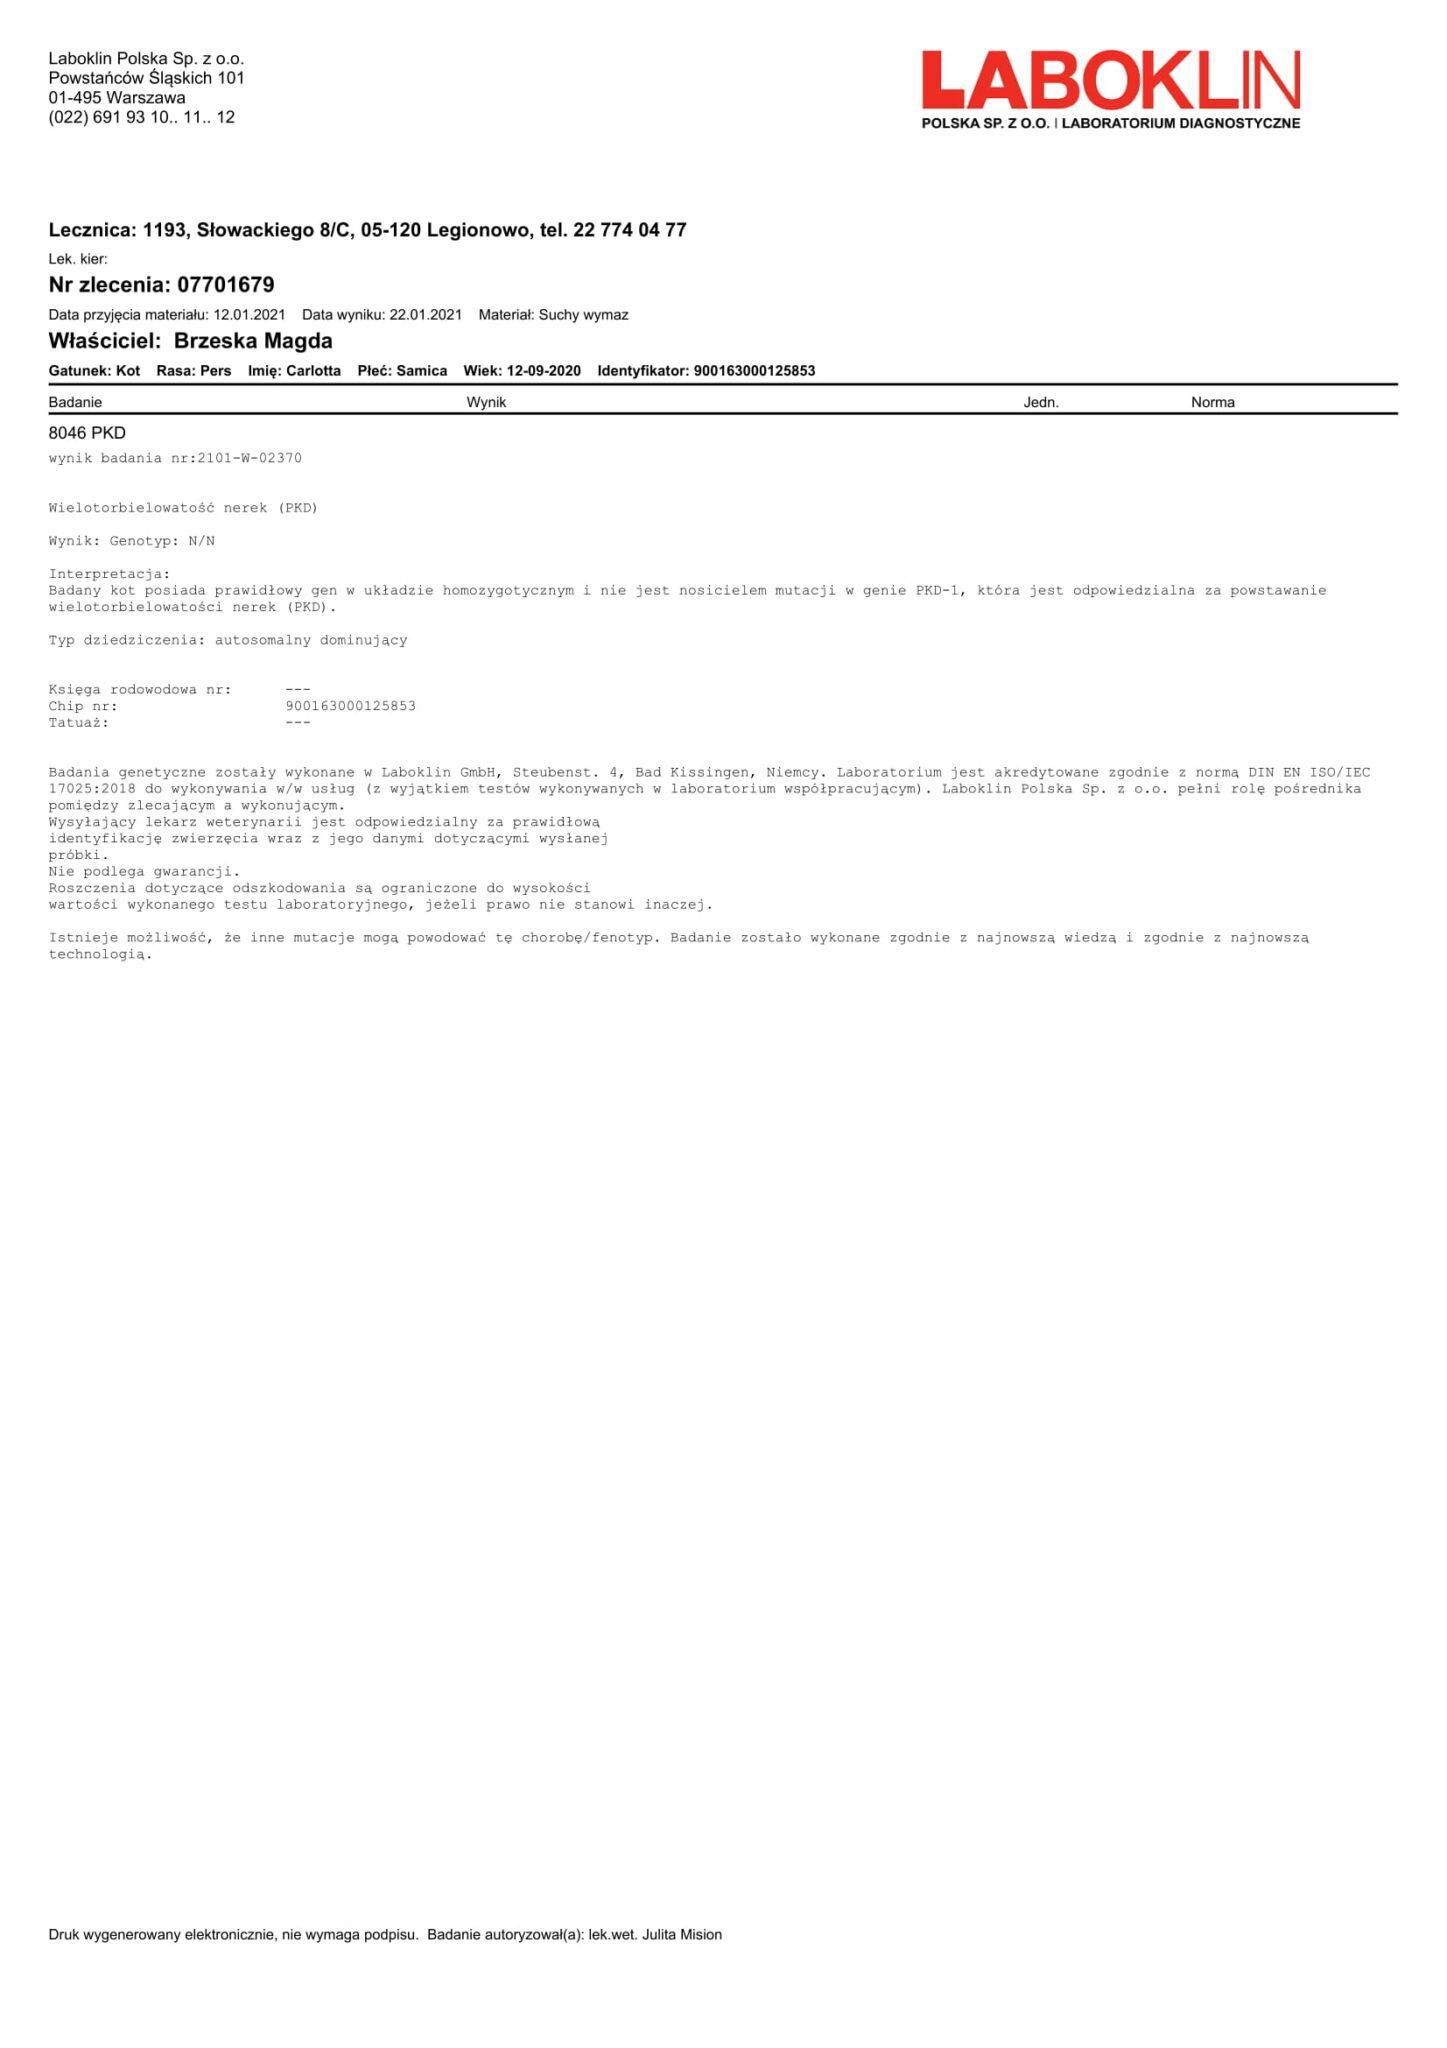 Brzeska-Magda-07701679-22.01.2021-1_1-1-1 Breeding